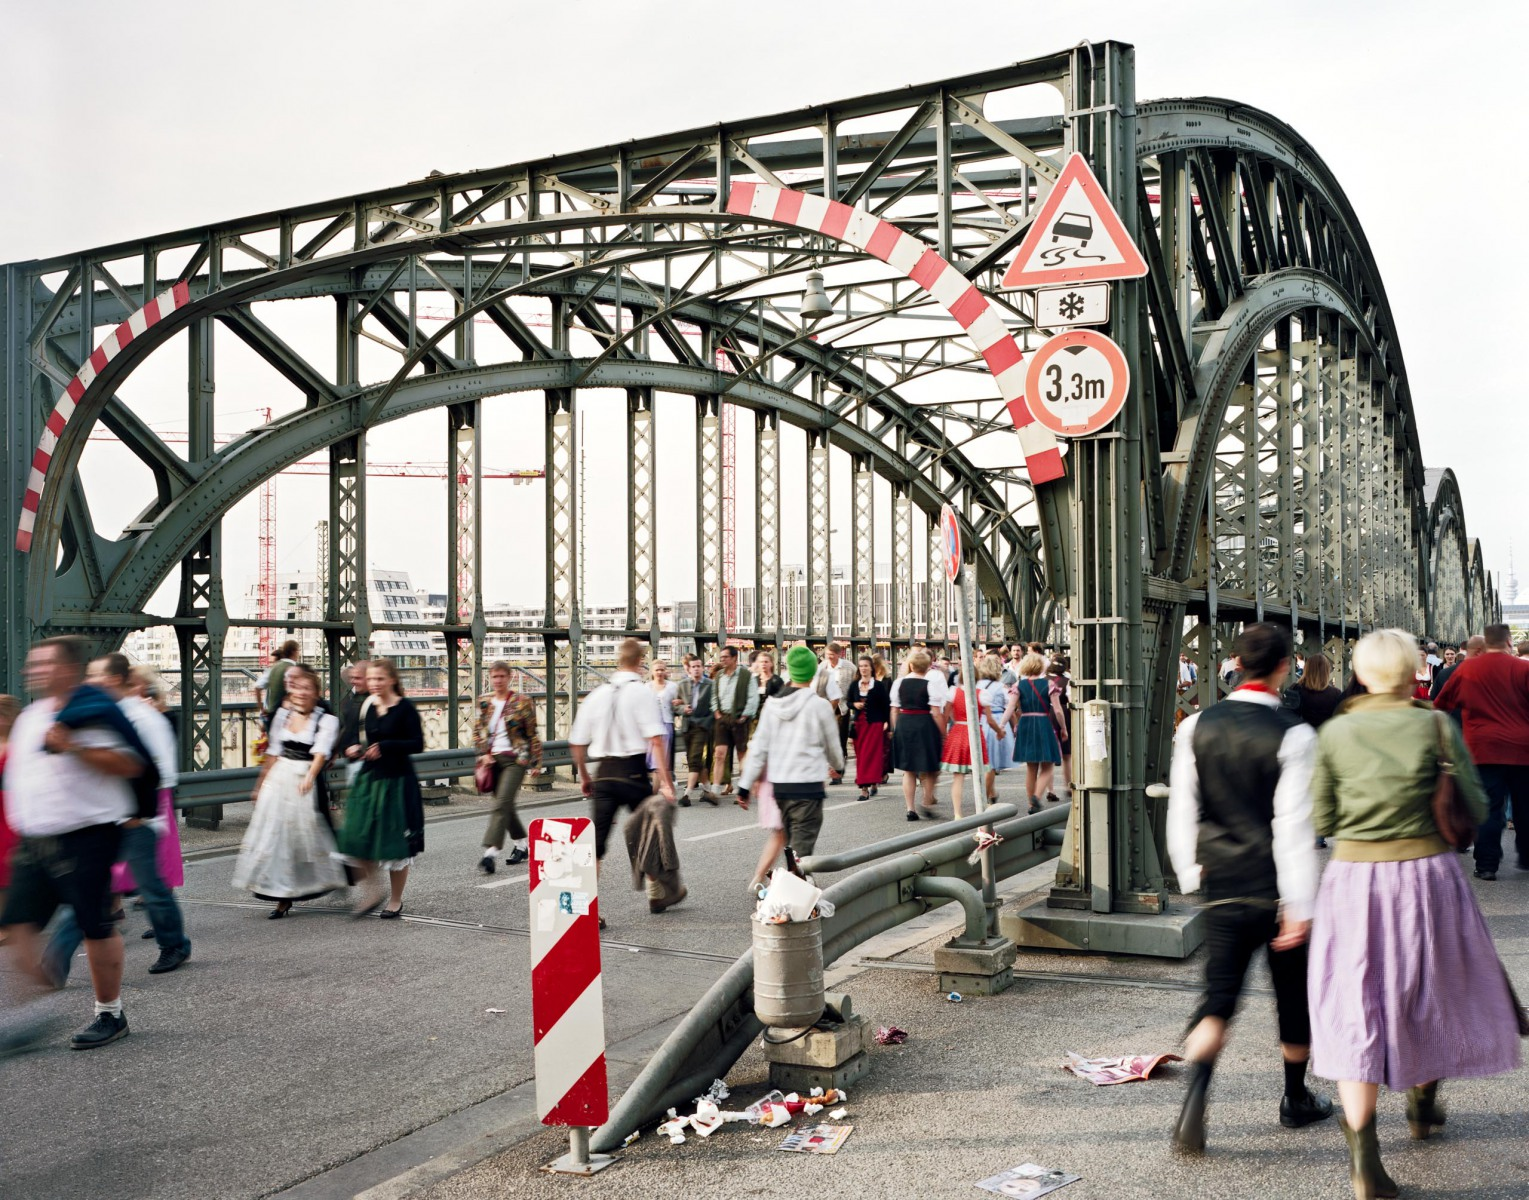 Hackerbrücke, September 2009